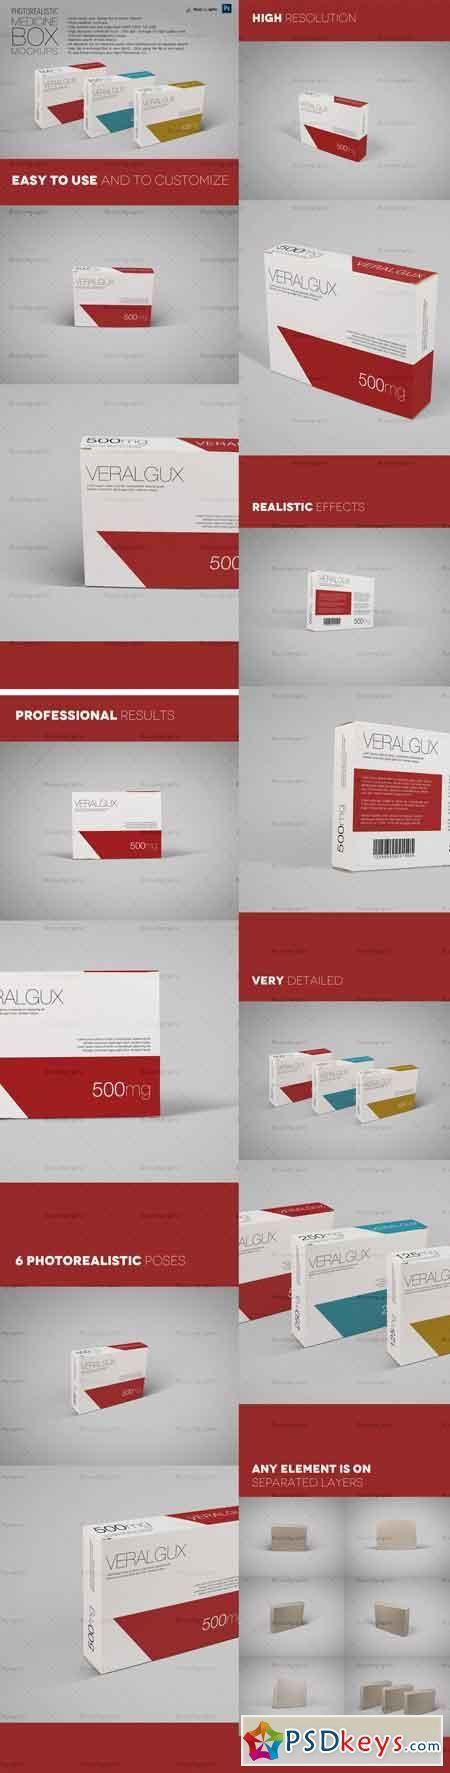 Download Photorealistic Medicine Box Mockups 363059 Free Download Photoshop Medicine Boxes Box Mockup